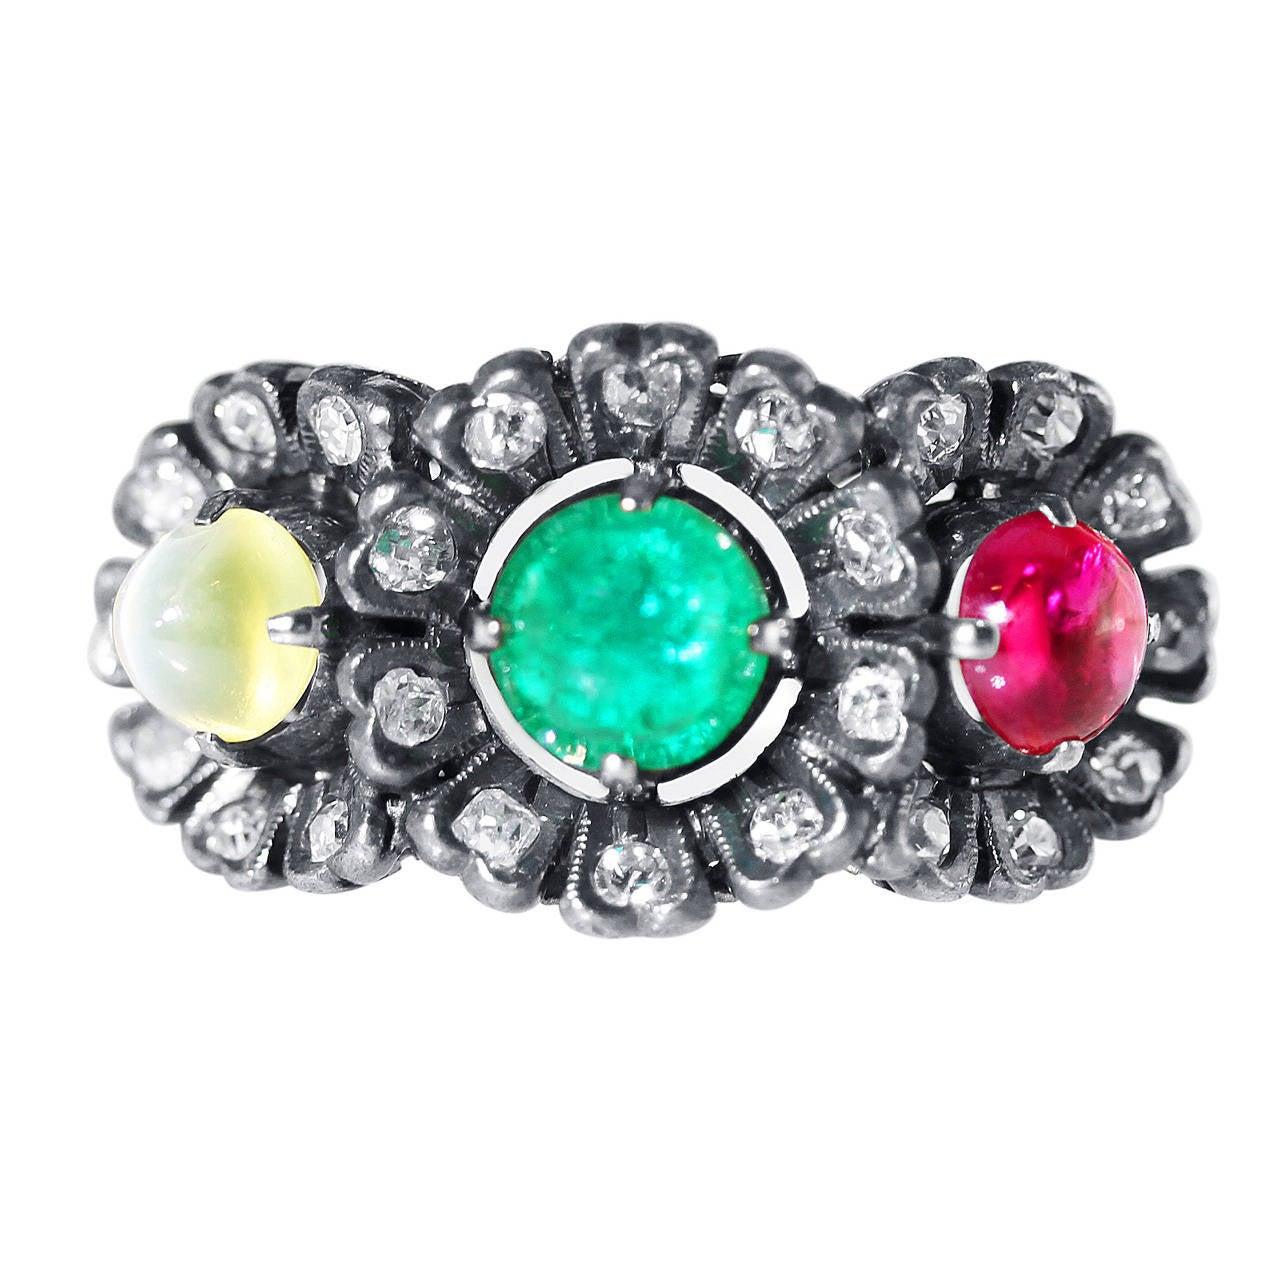 Antique Catseye Chrysoberyl Emerald Ruby Diamond Silver